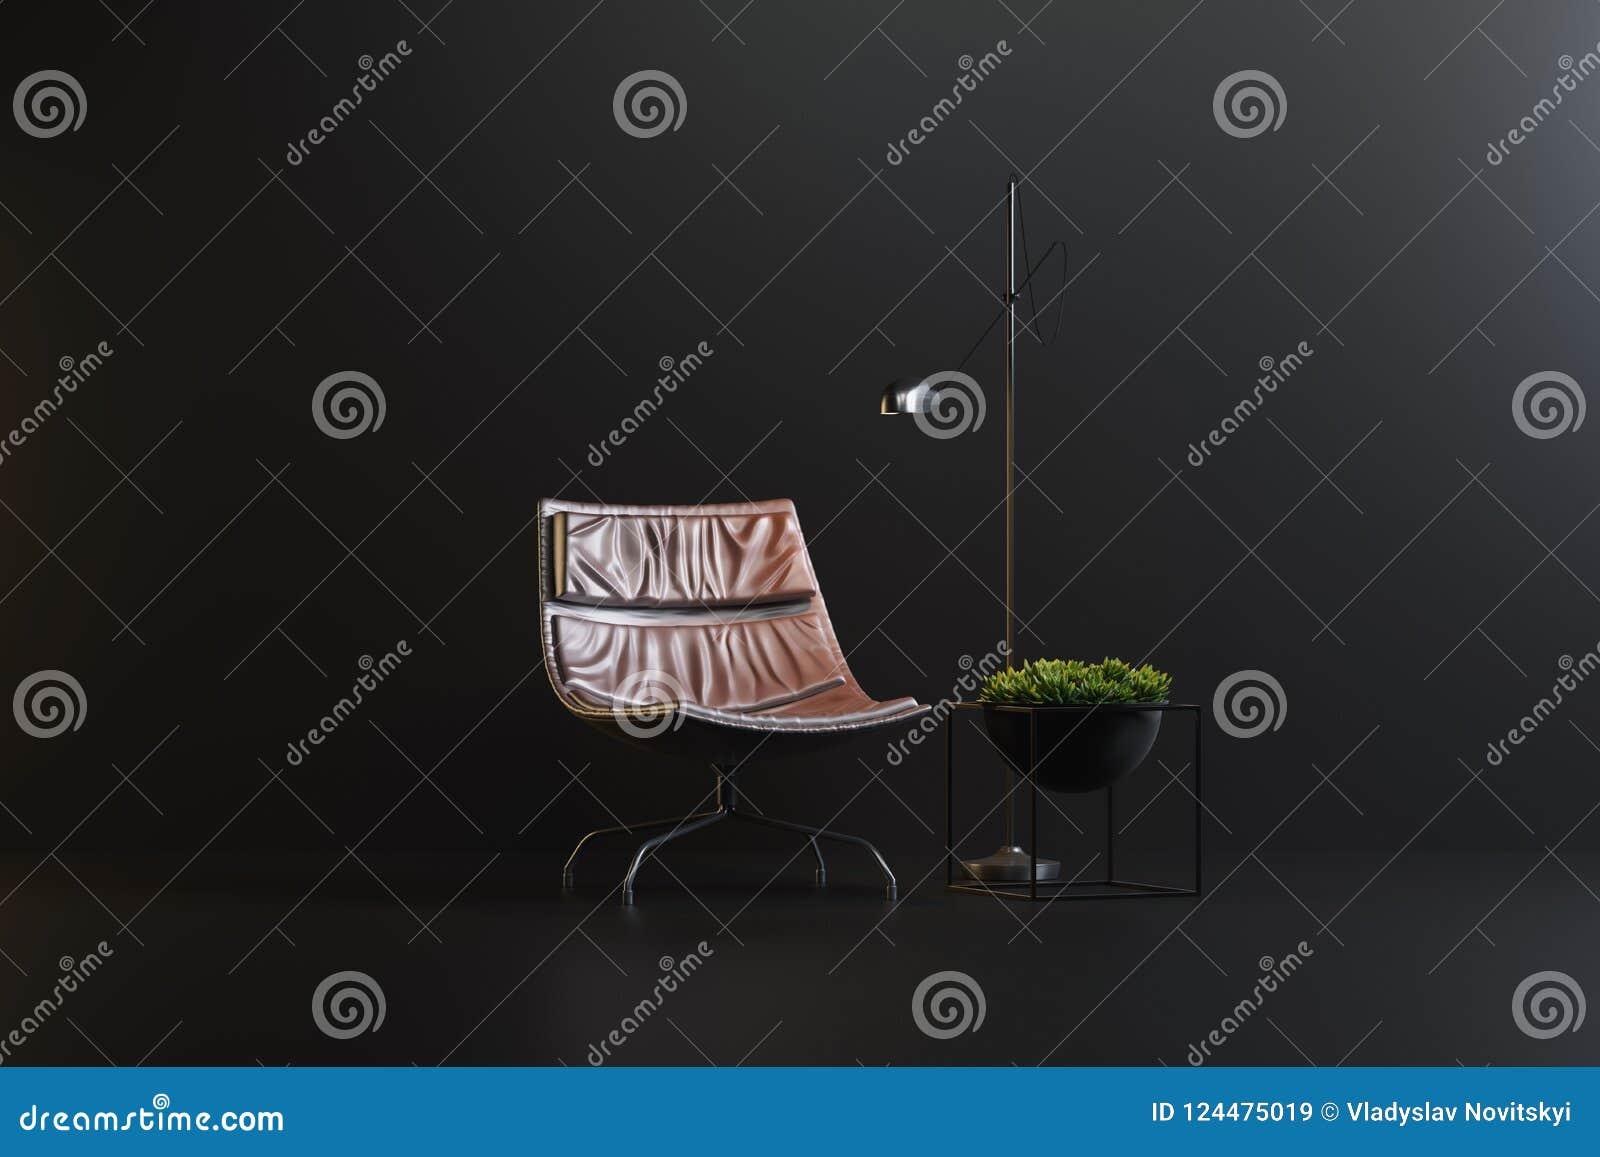 Studio setting of interior items